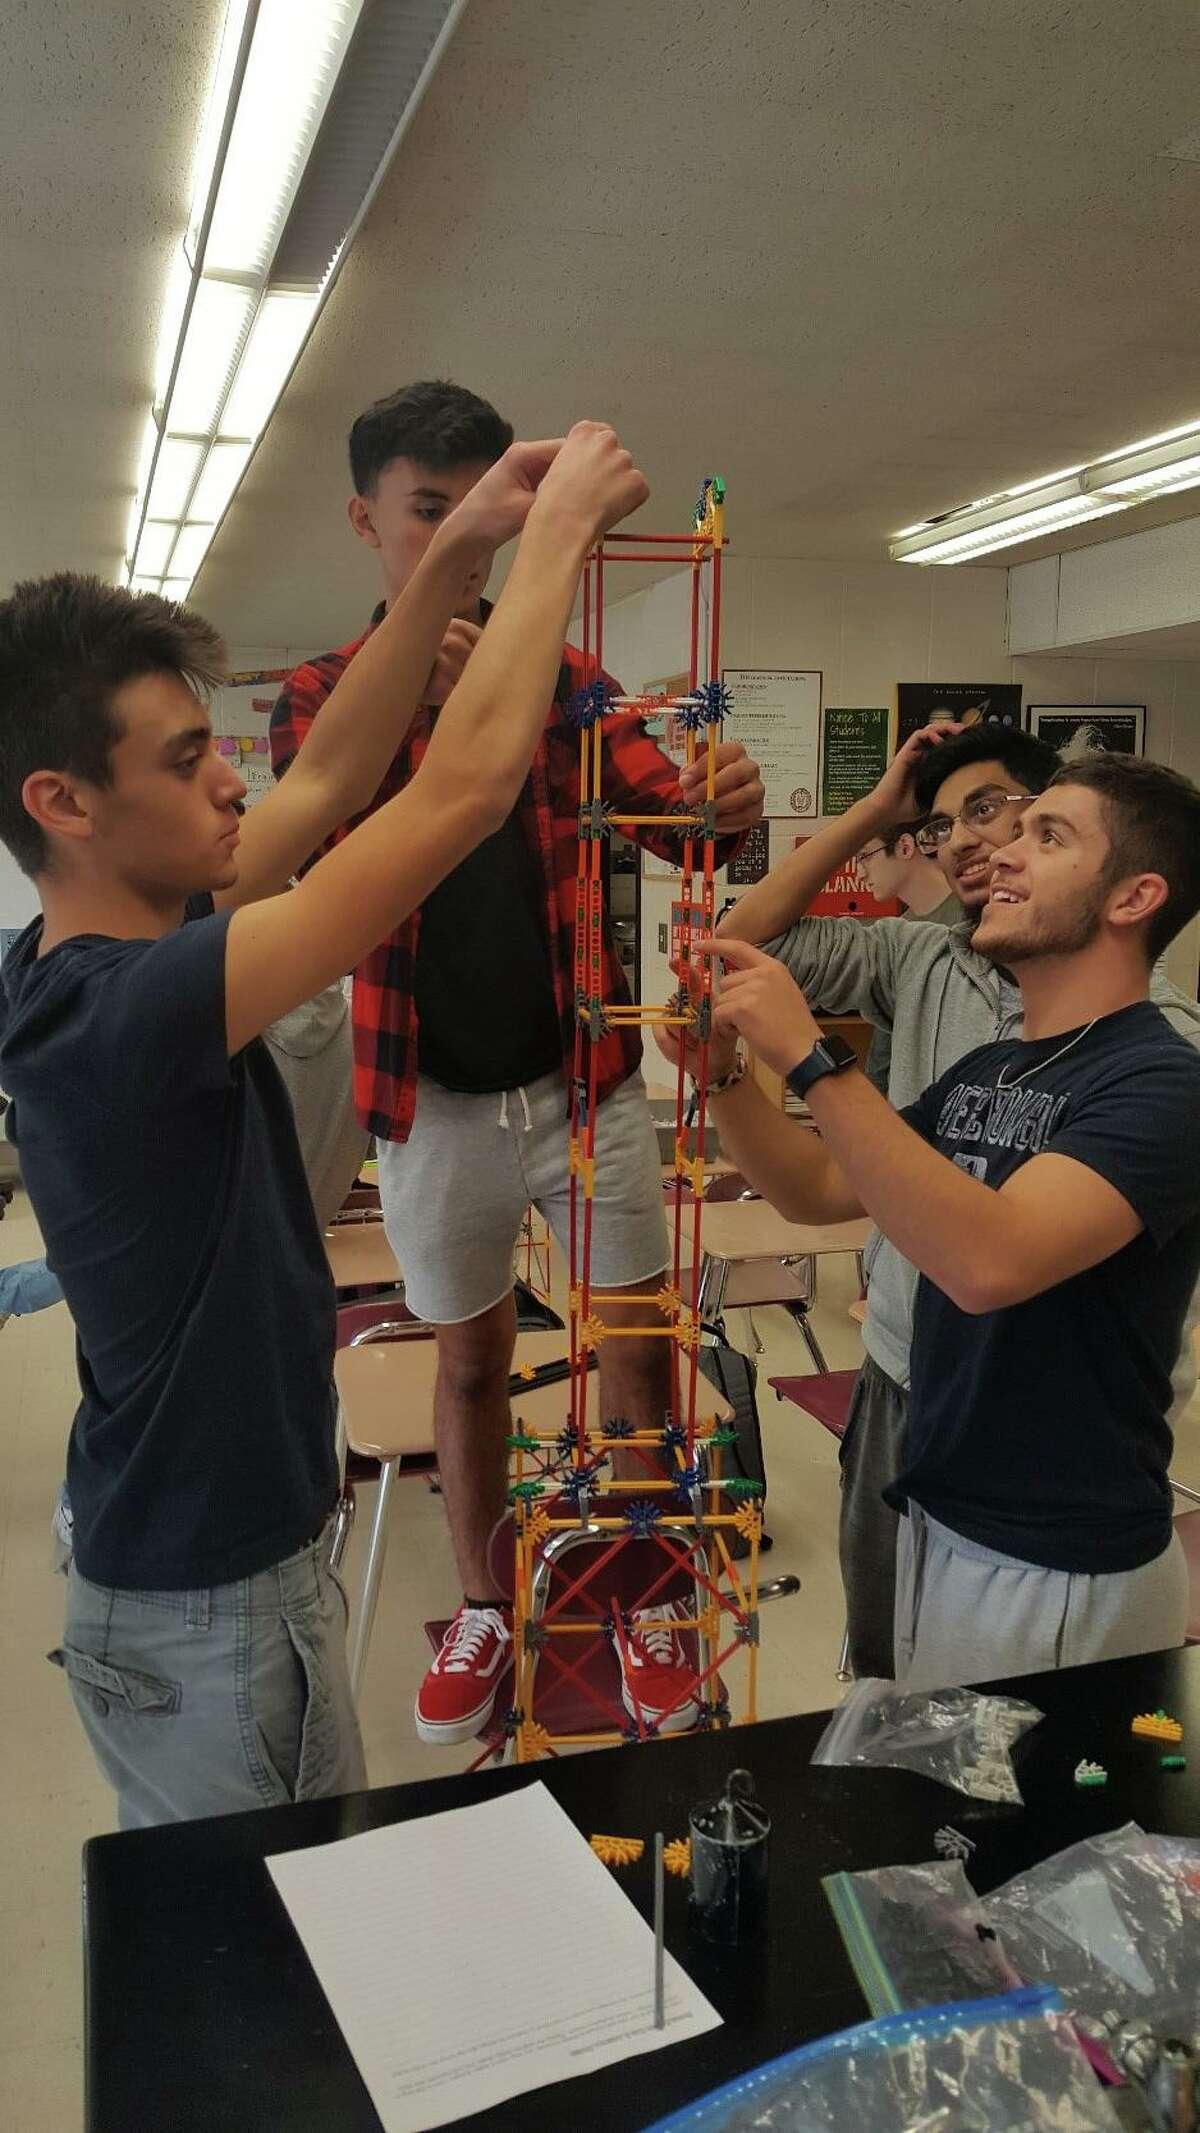 David Teti, John McLaughlin, Muhammad Saleem and Justin Mattiello construct a K'Nex tower they designed using the engineering design process.